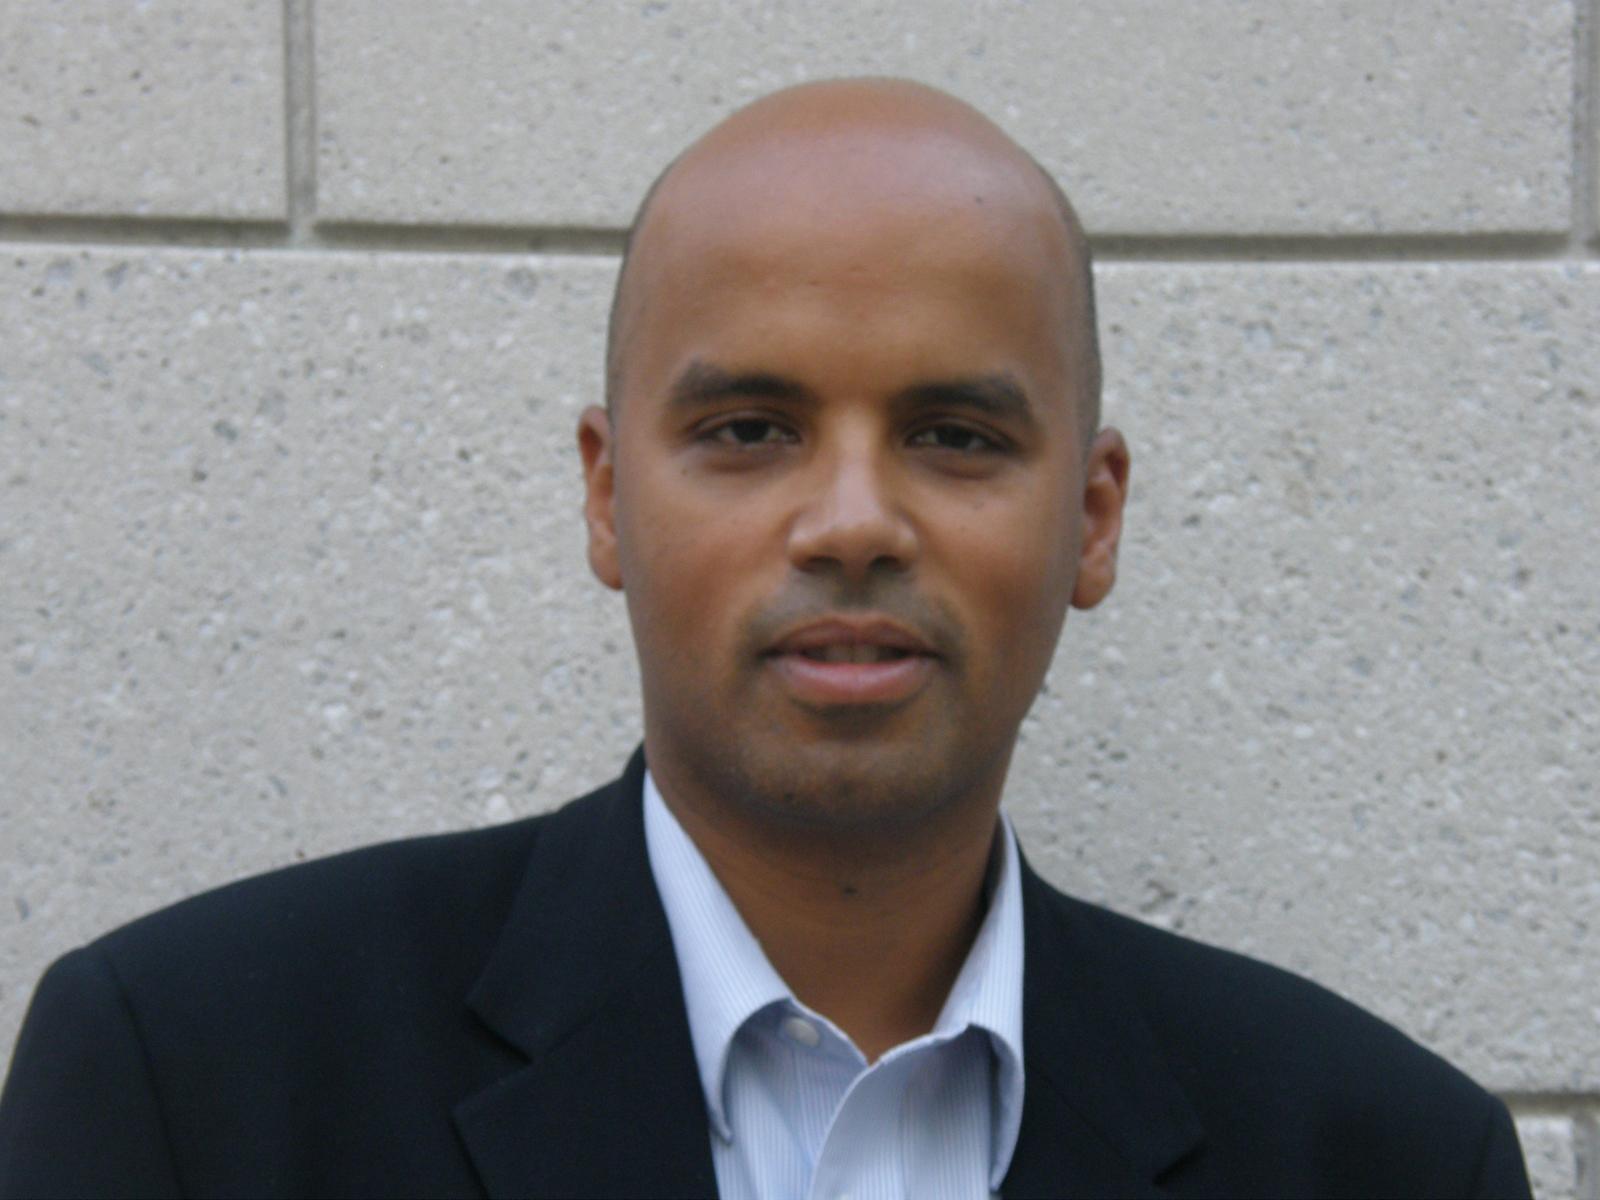 Professor Suleiman Osman of George Washington University in Washington, DC.